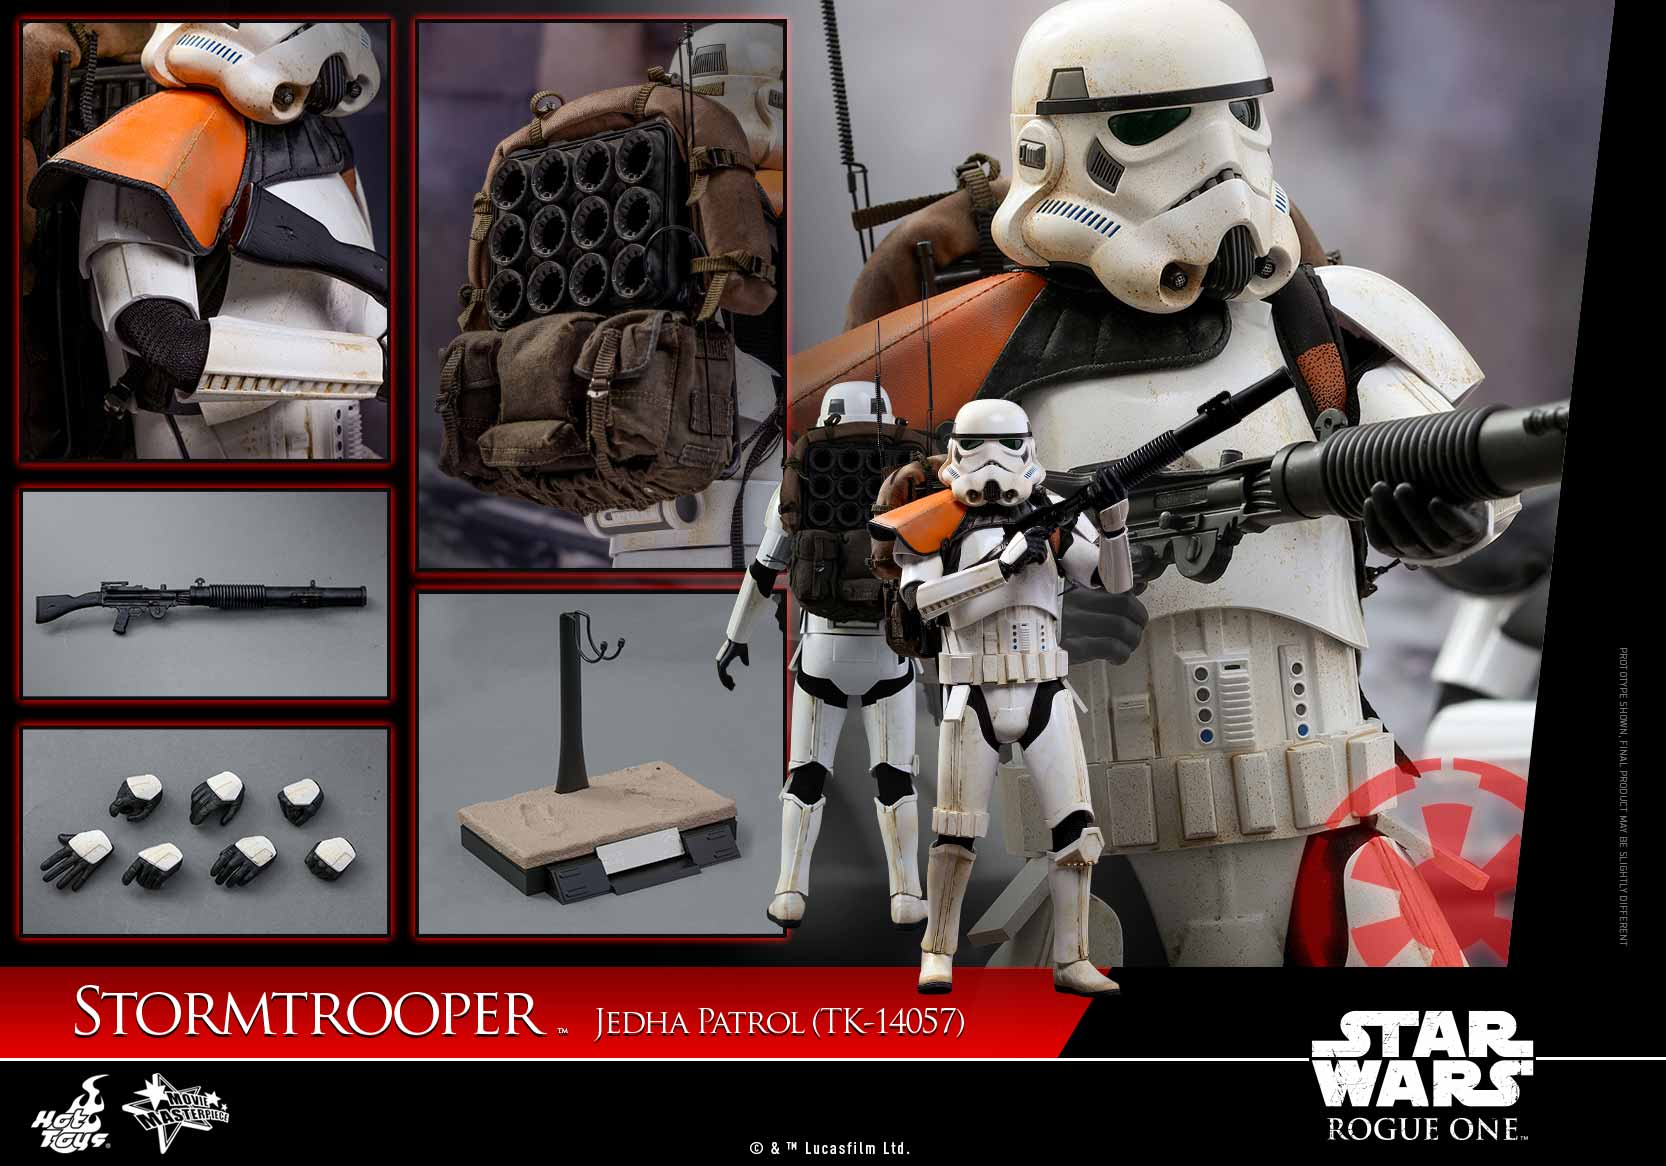 hot-toys-swro-stormtrooper-jedha-patrol-tk-14057-collectible-figure_pr7